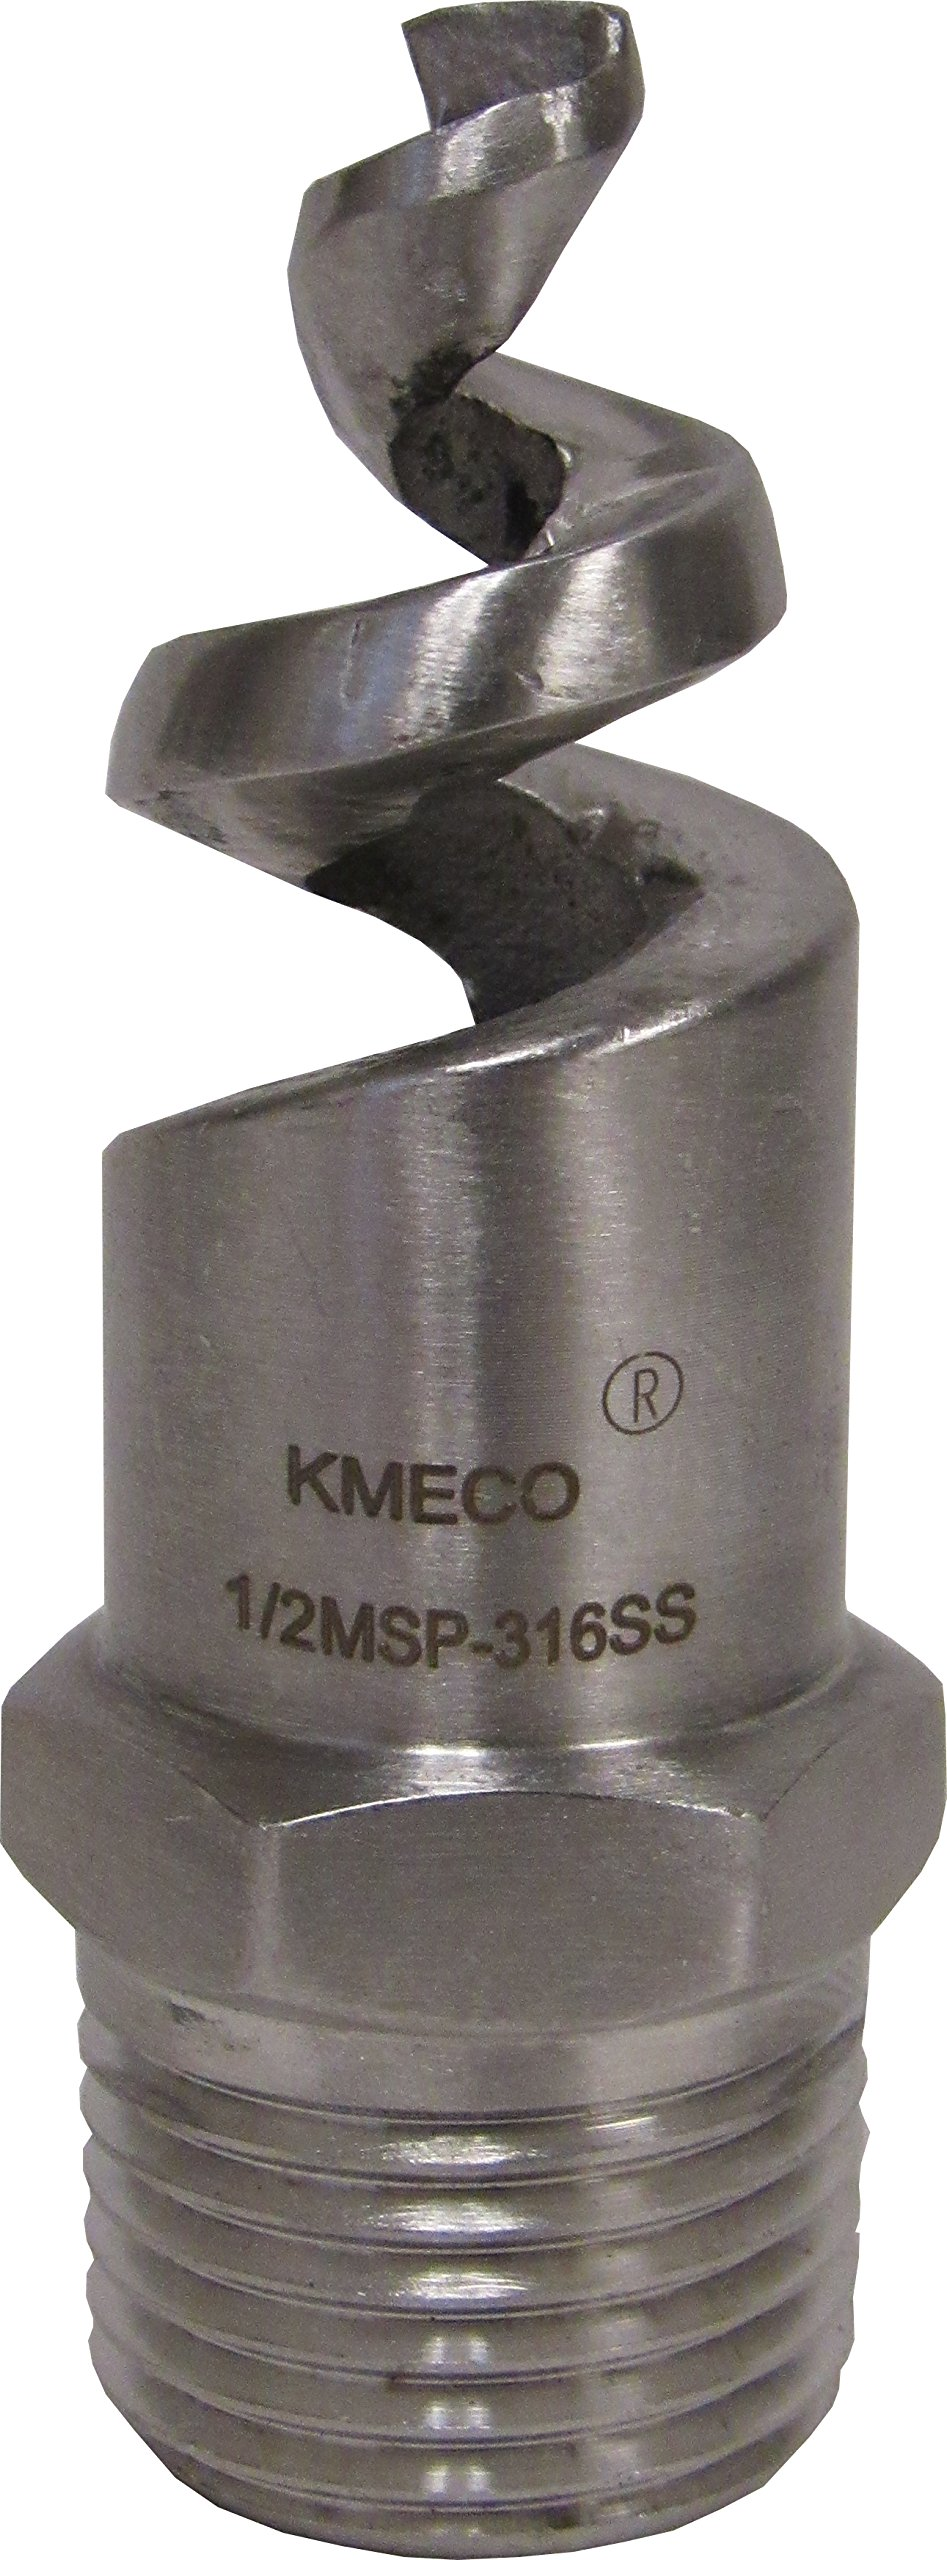 KMECO 1/2'' NPT 316 STAINLESS STEEL SPIRAL SPRAY NOZZLE